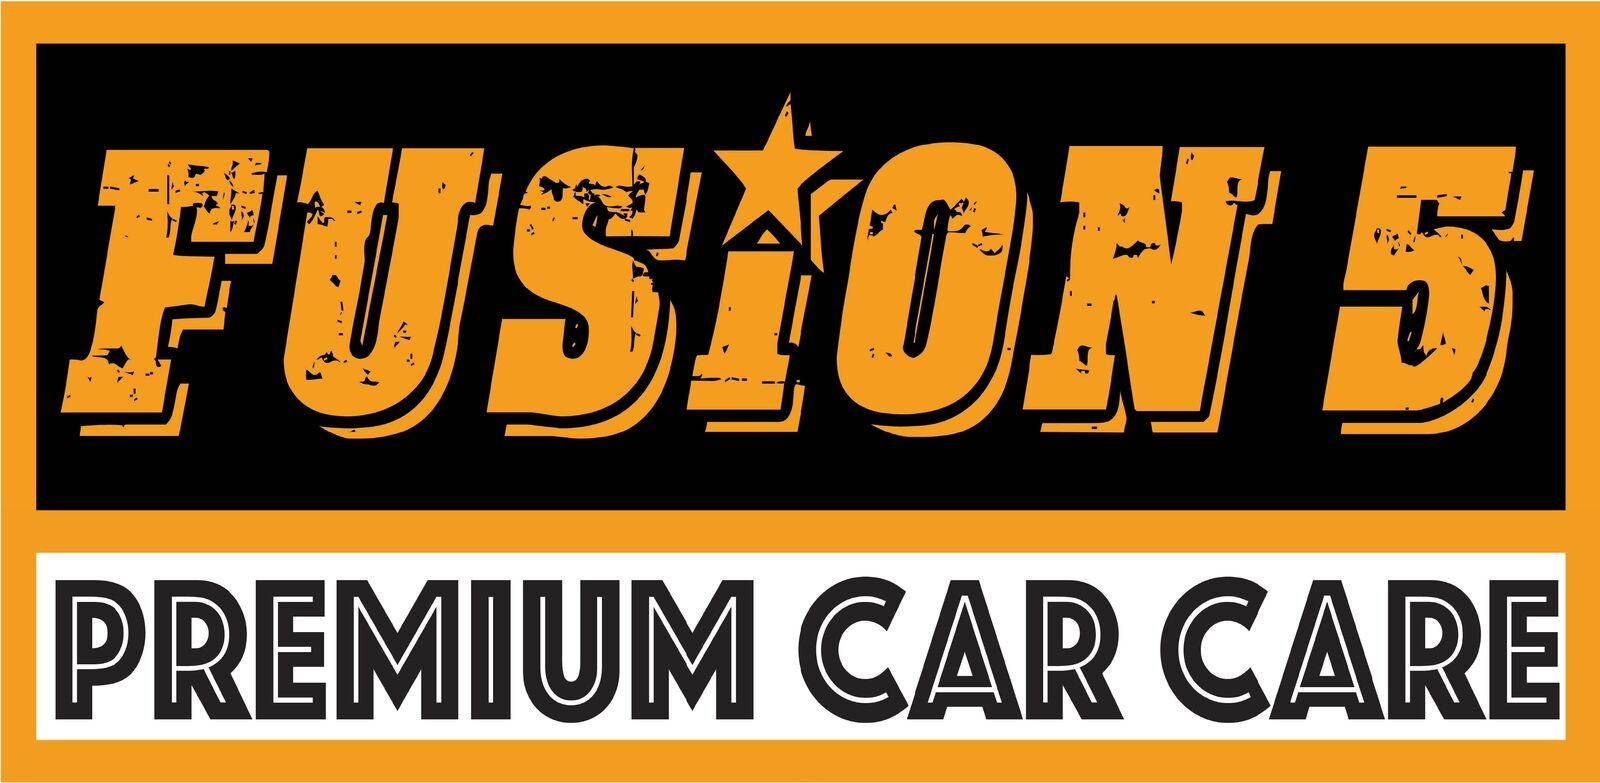 Fusion5motorsports